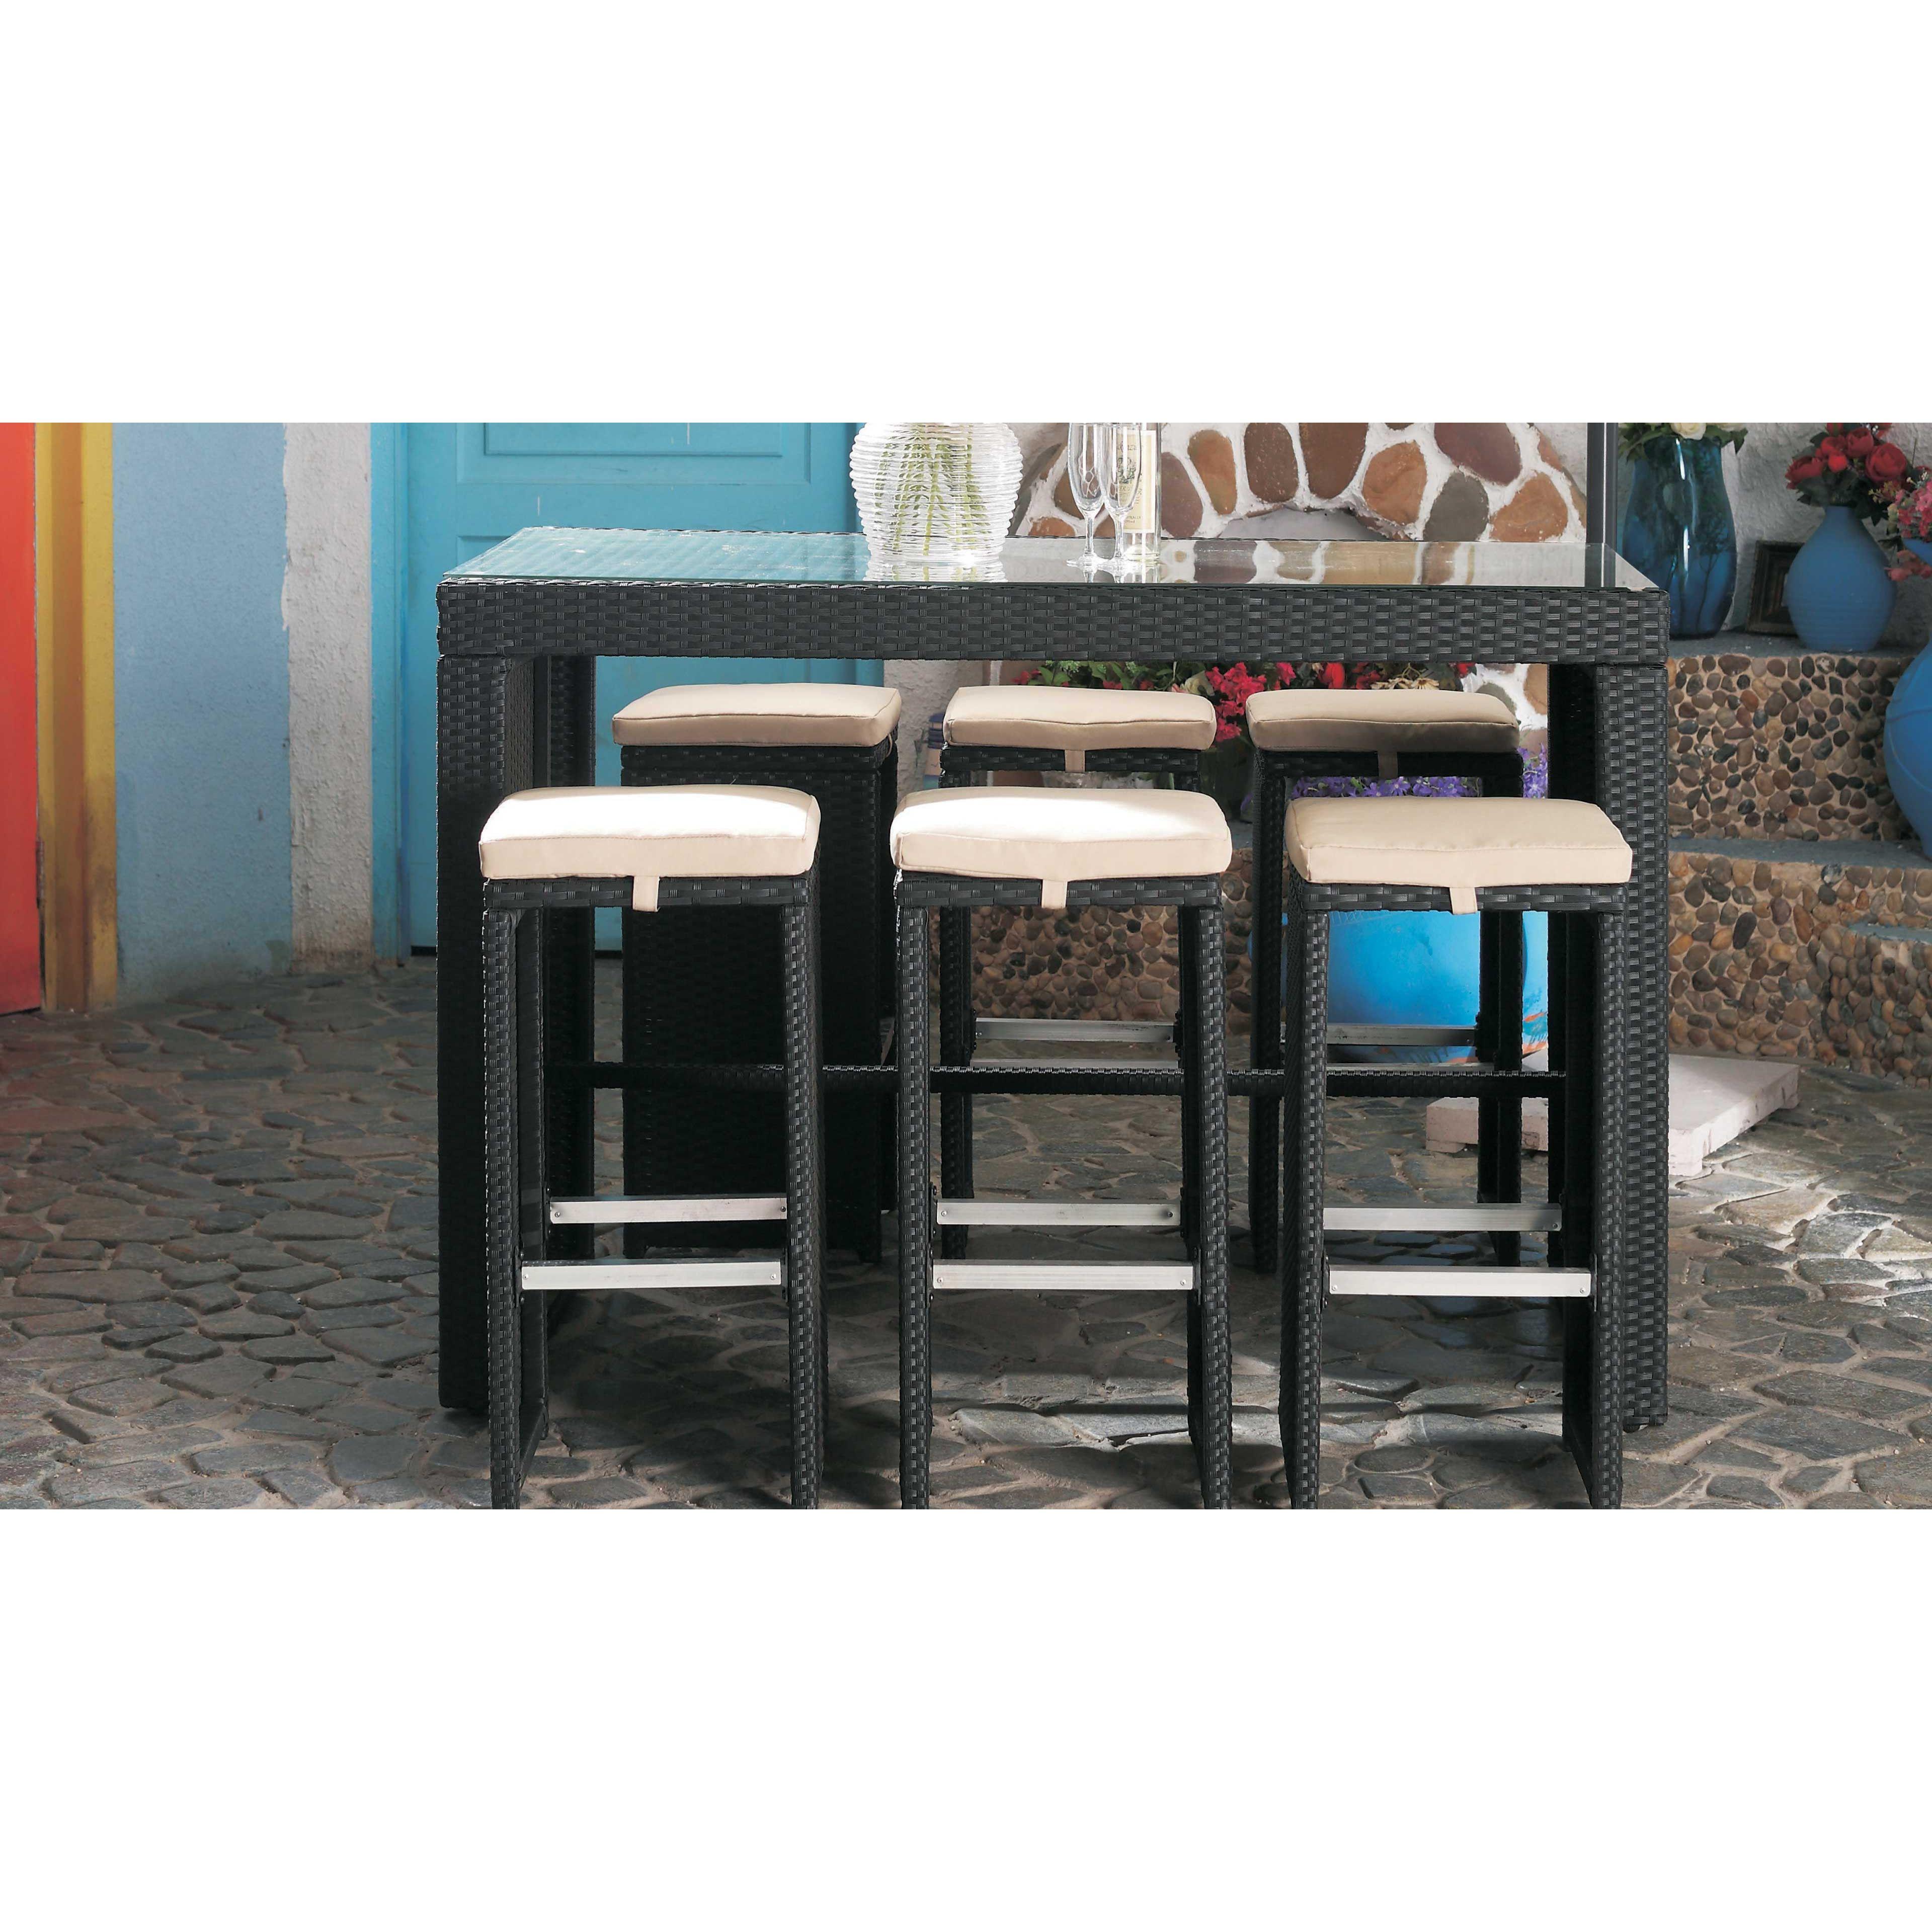 Table bar de jardin en résine tressée